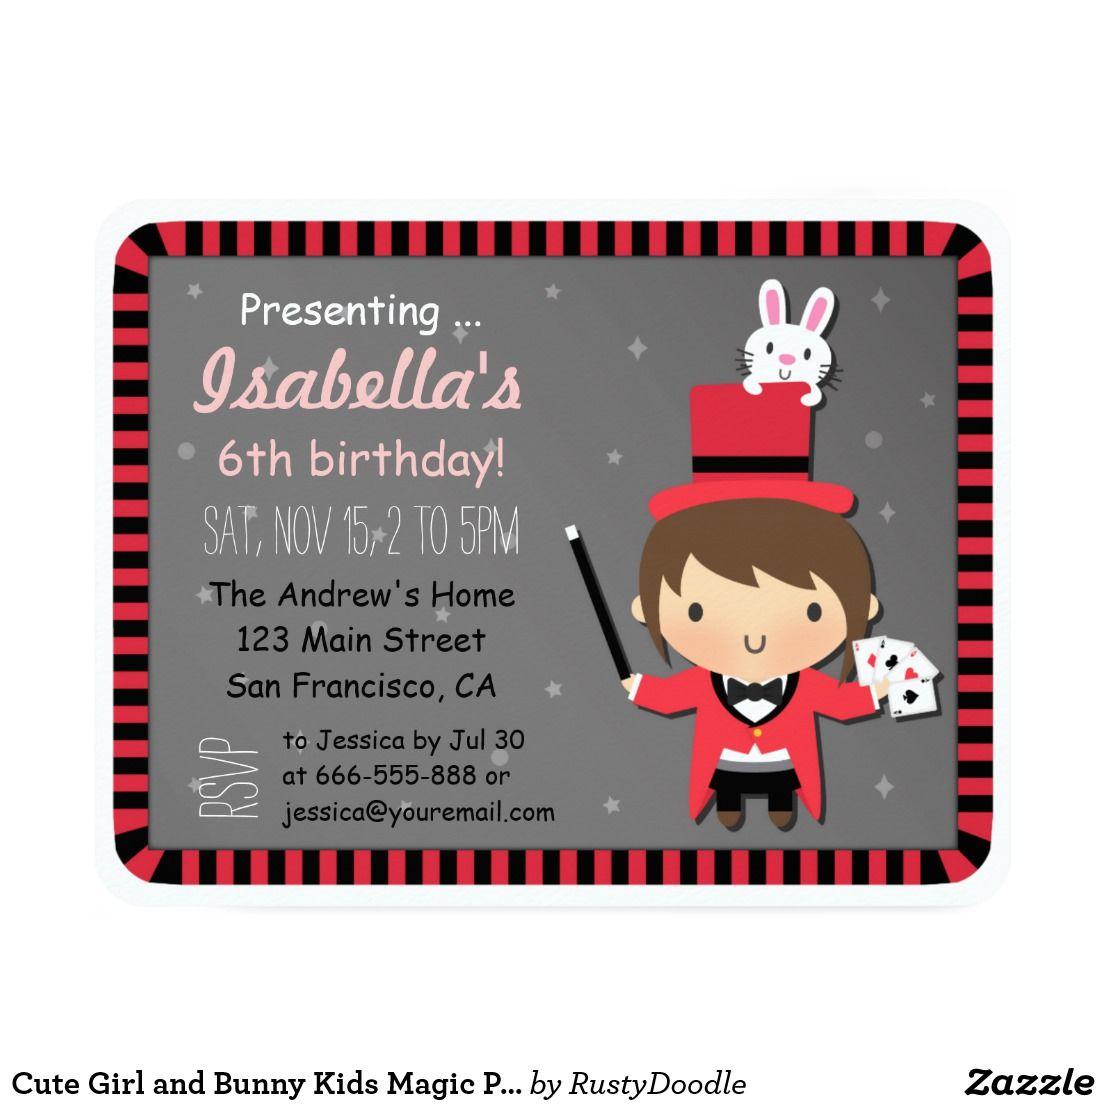 Cute Girl and Bunny Kids Magic Party Invitations | Chloe | Pinterest